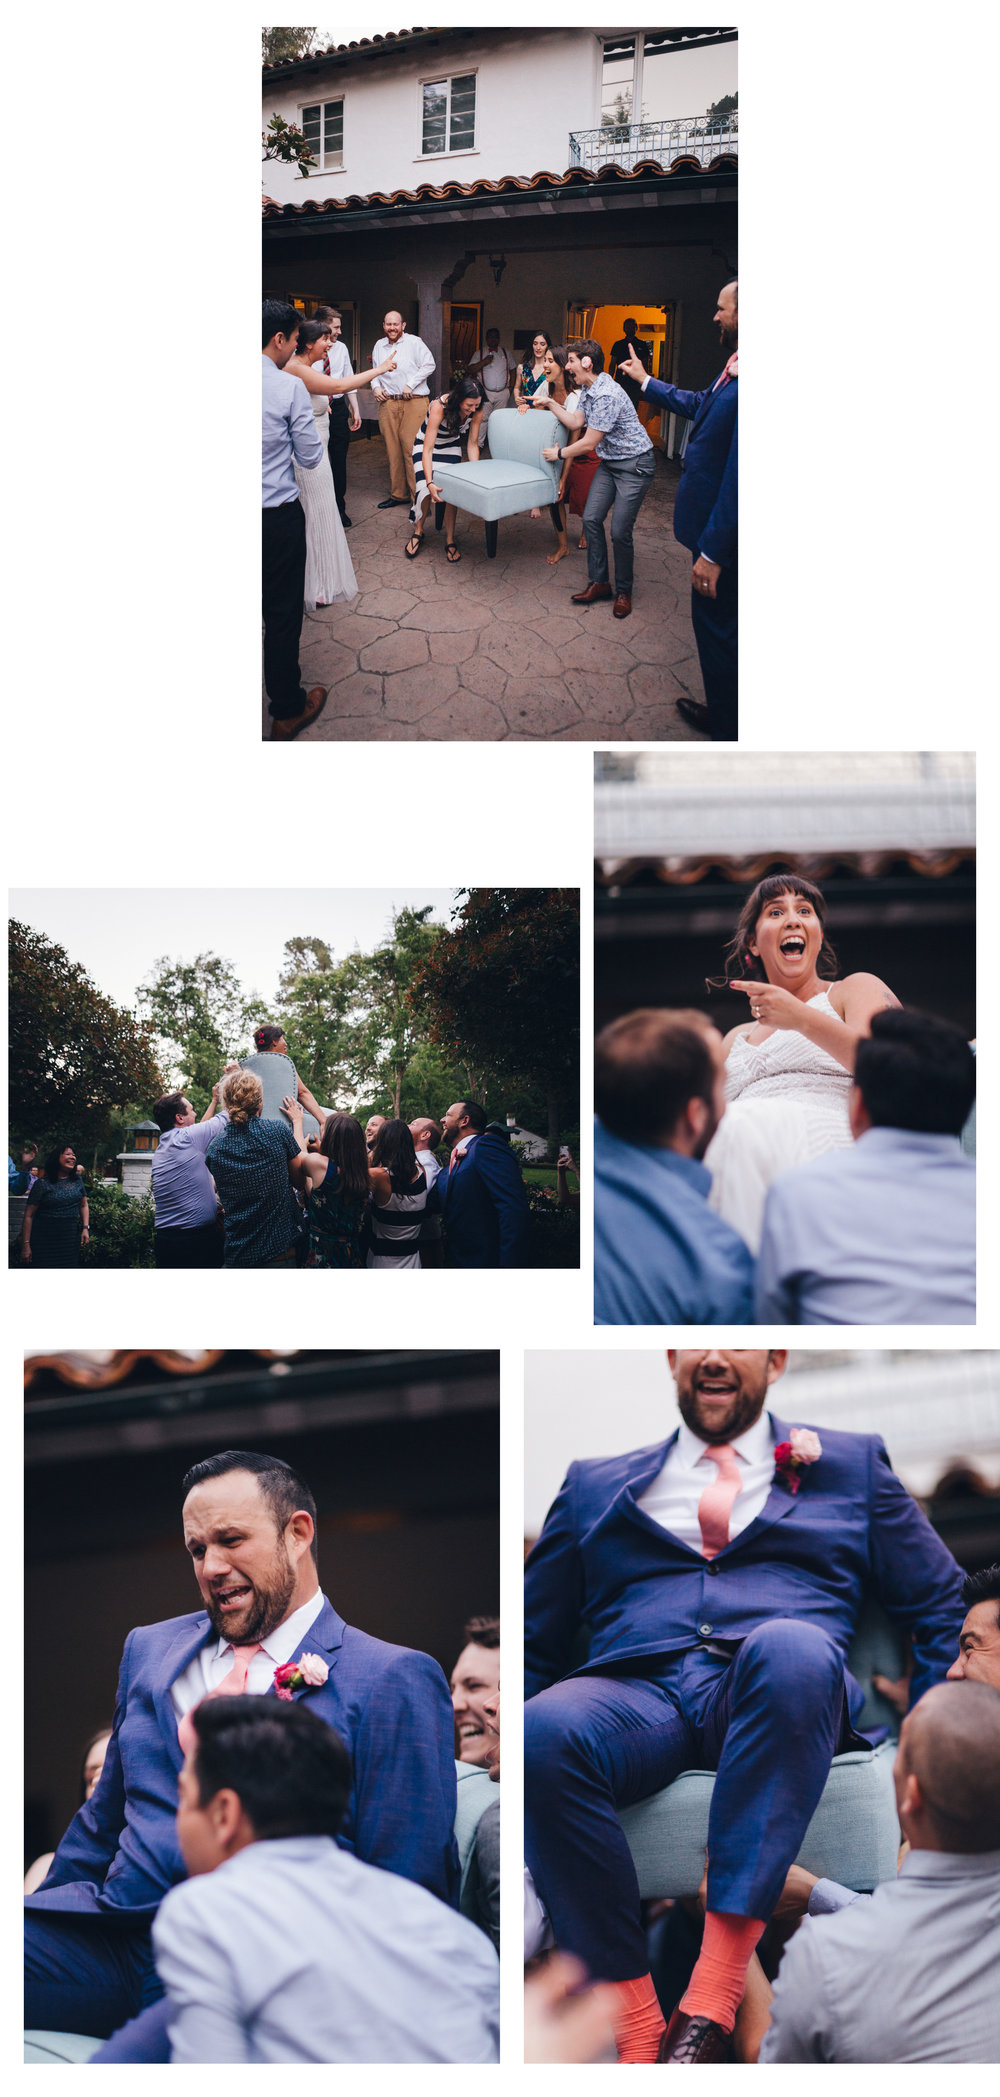 IG_wedding (86 of 110) copy.jpg